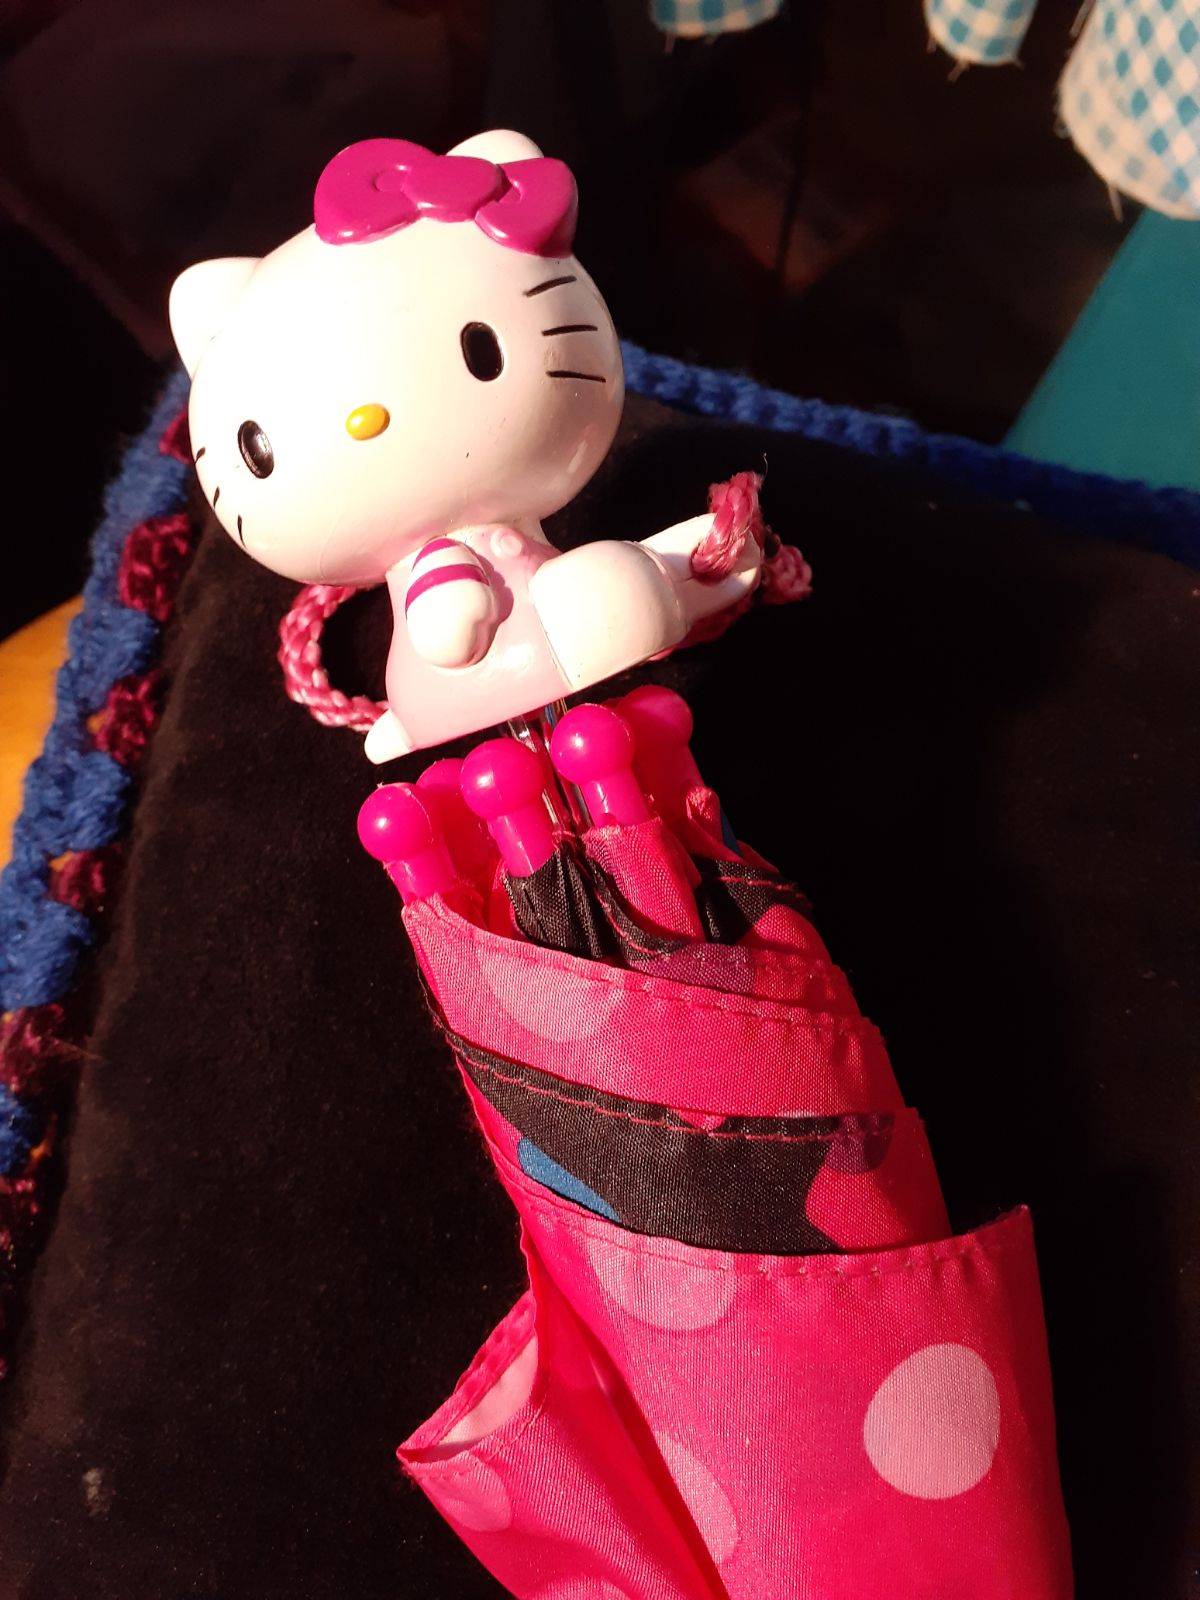 A Childs Hello Kitty Umbrella